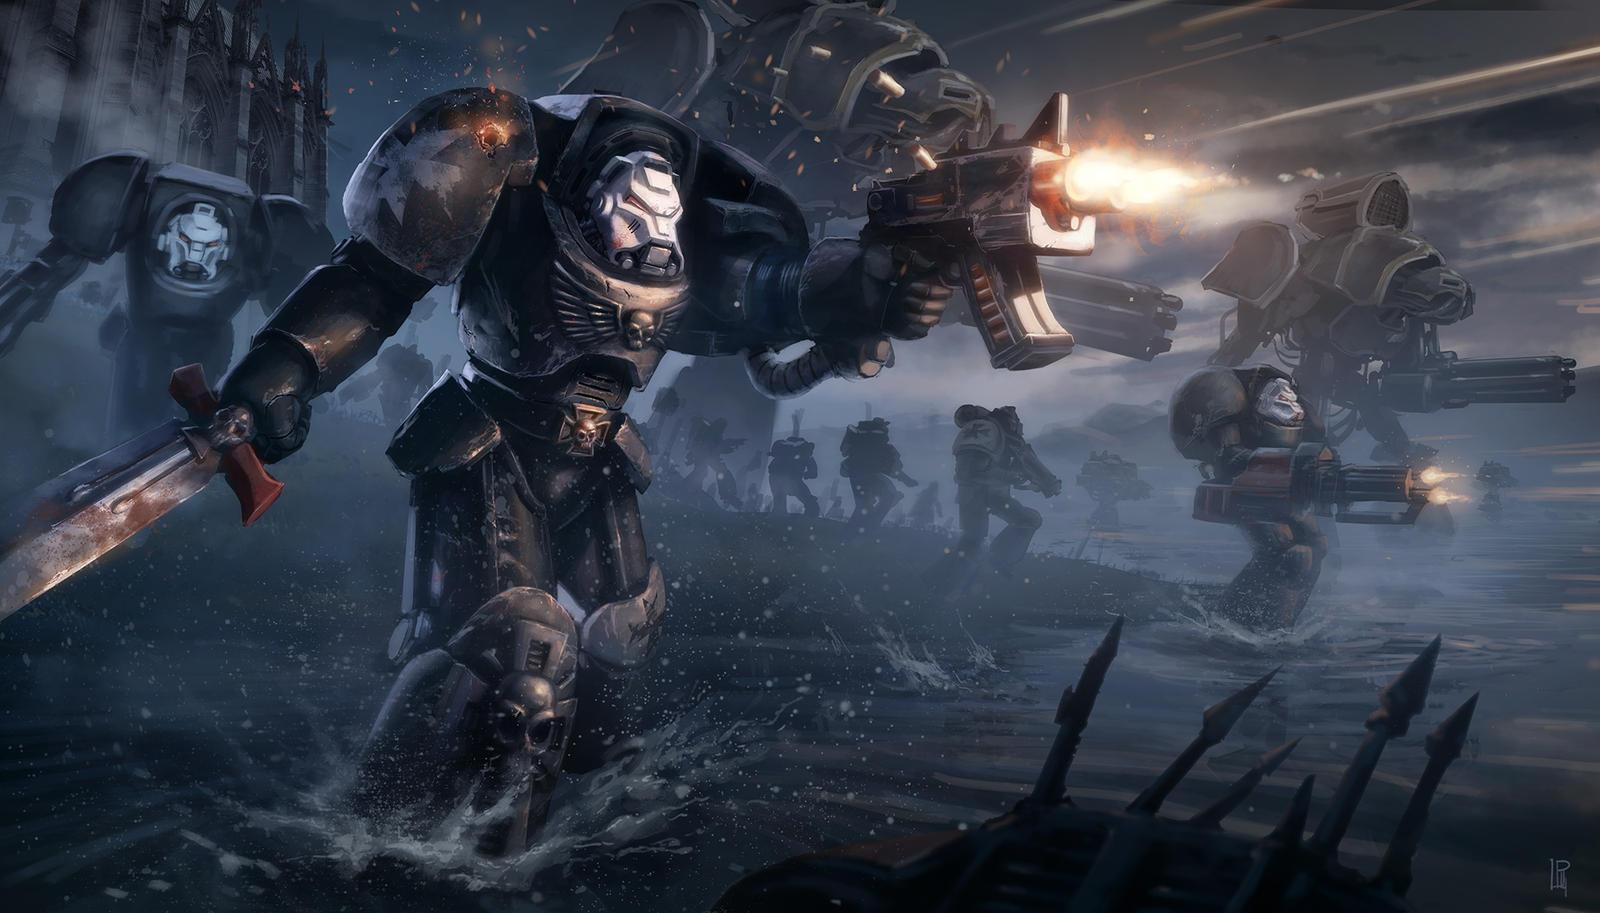 Warhammer 40k death company wallpaper - Warhammer 40k Black Templars Terminator Tribute By Pierreloyvet